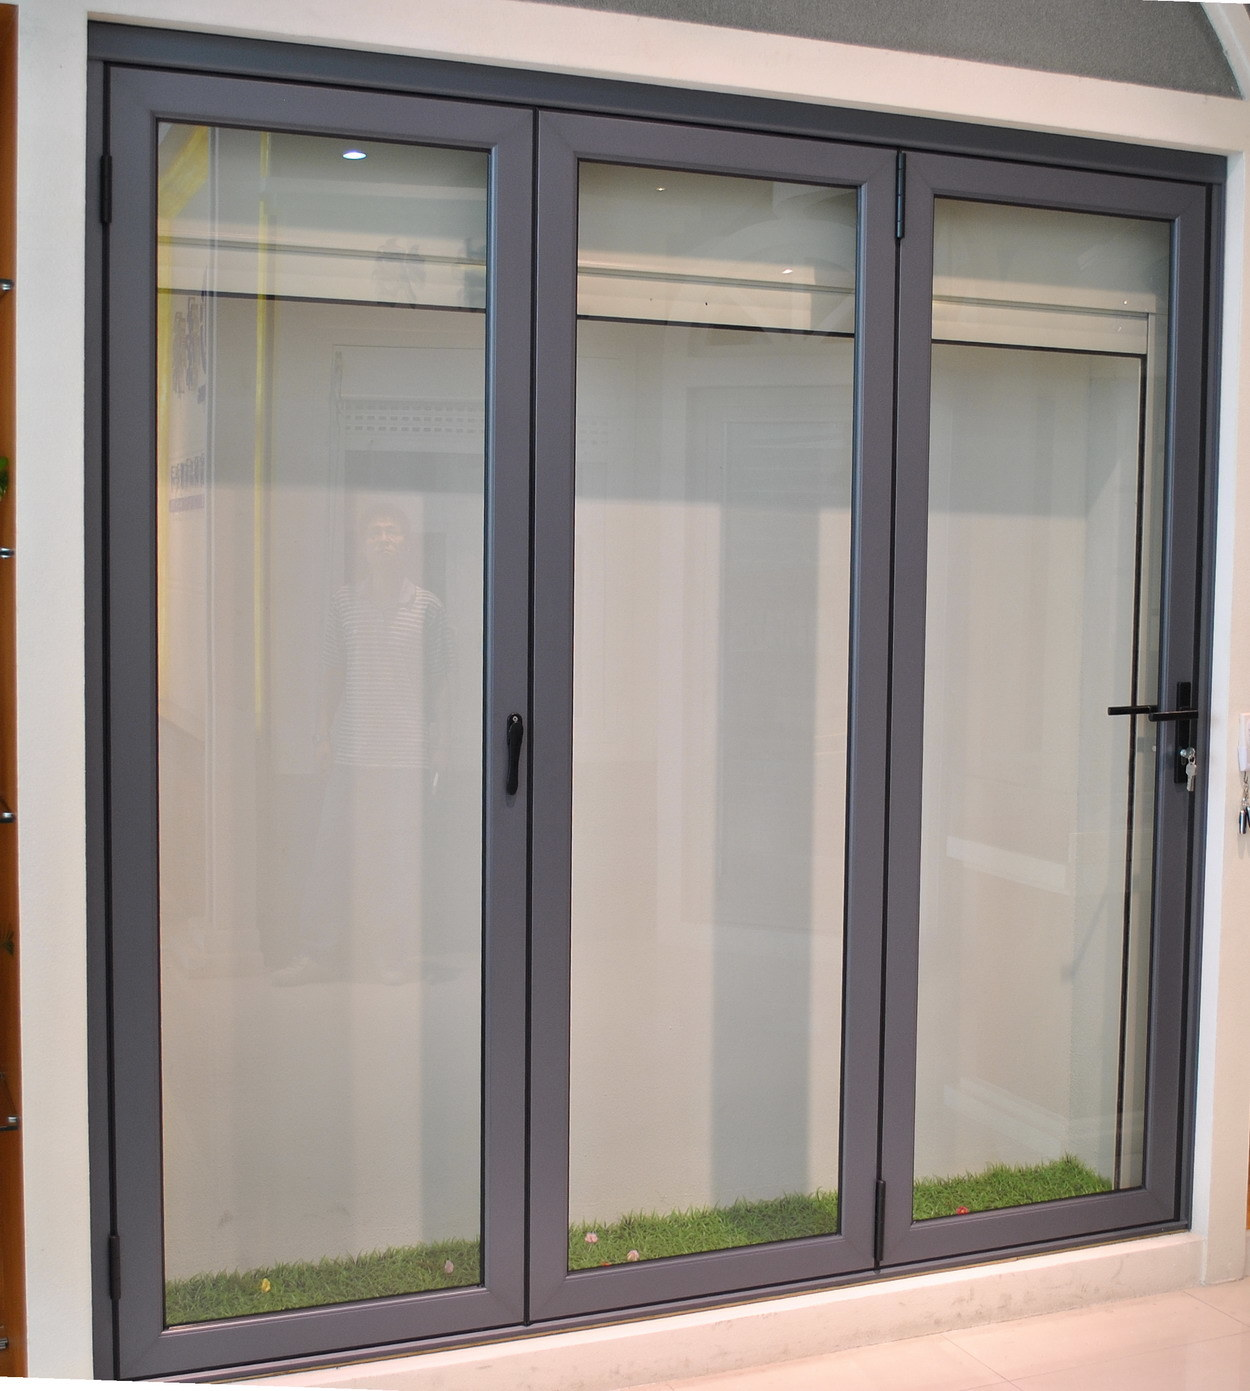 China glass sliding door hl 903 china glass sliding for Aluminium folding doors